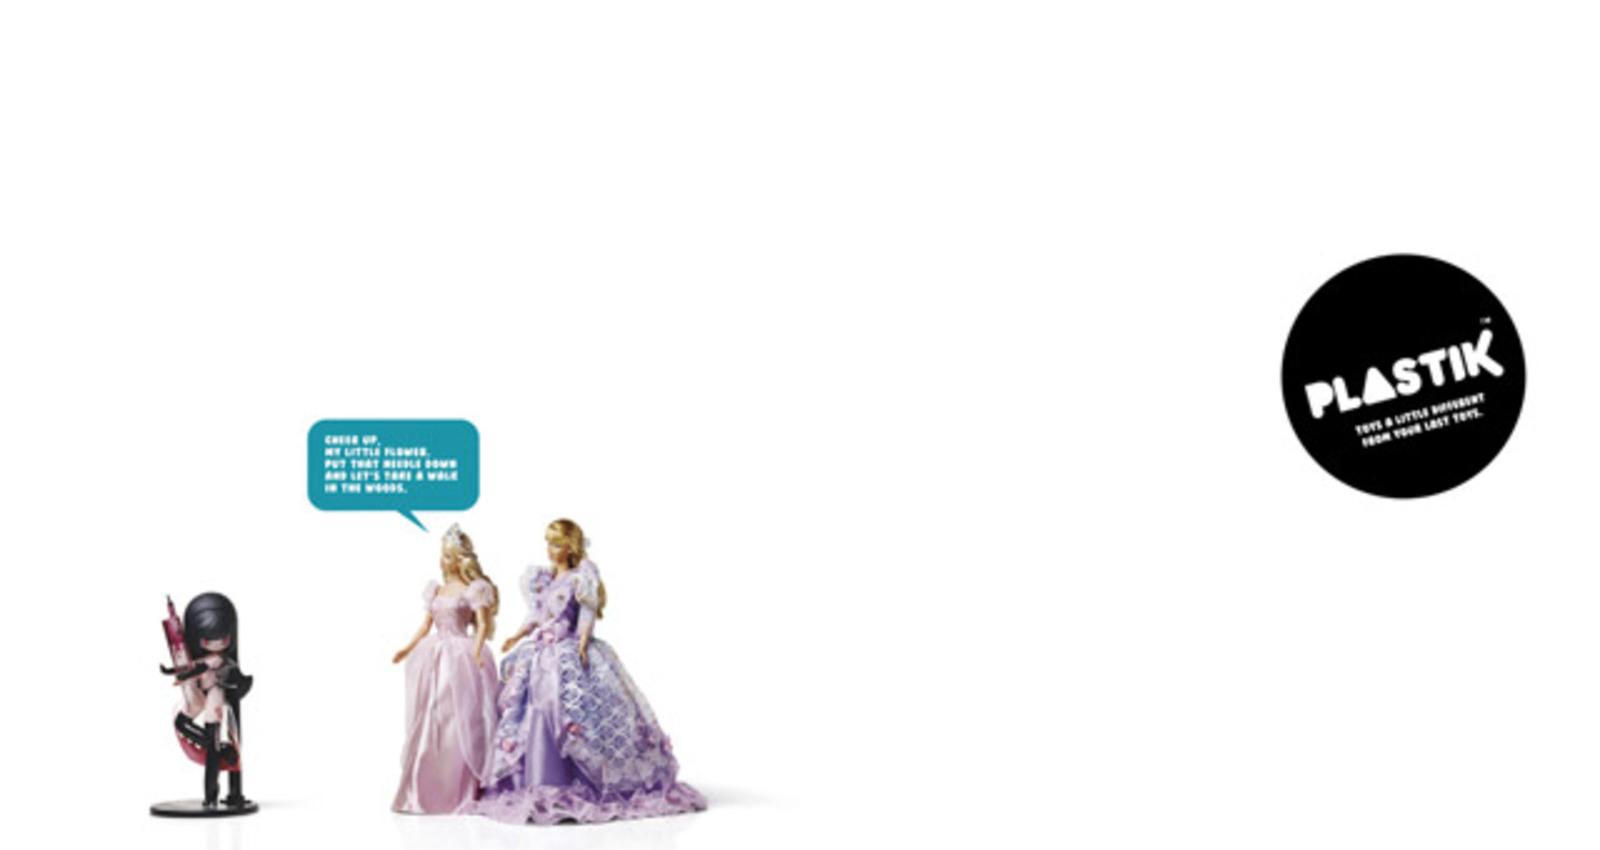 Plastik Campaign